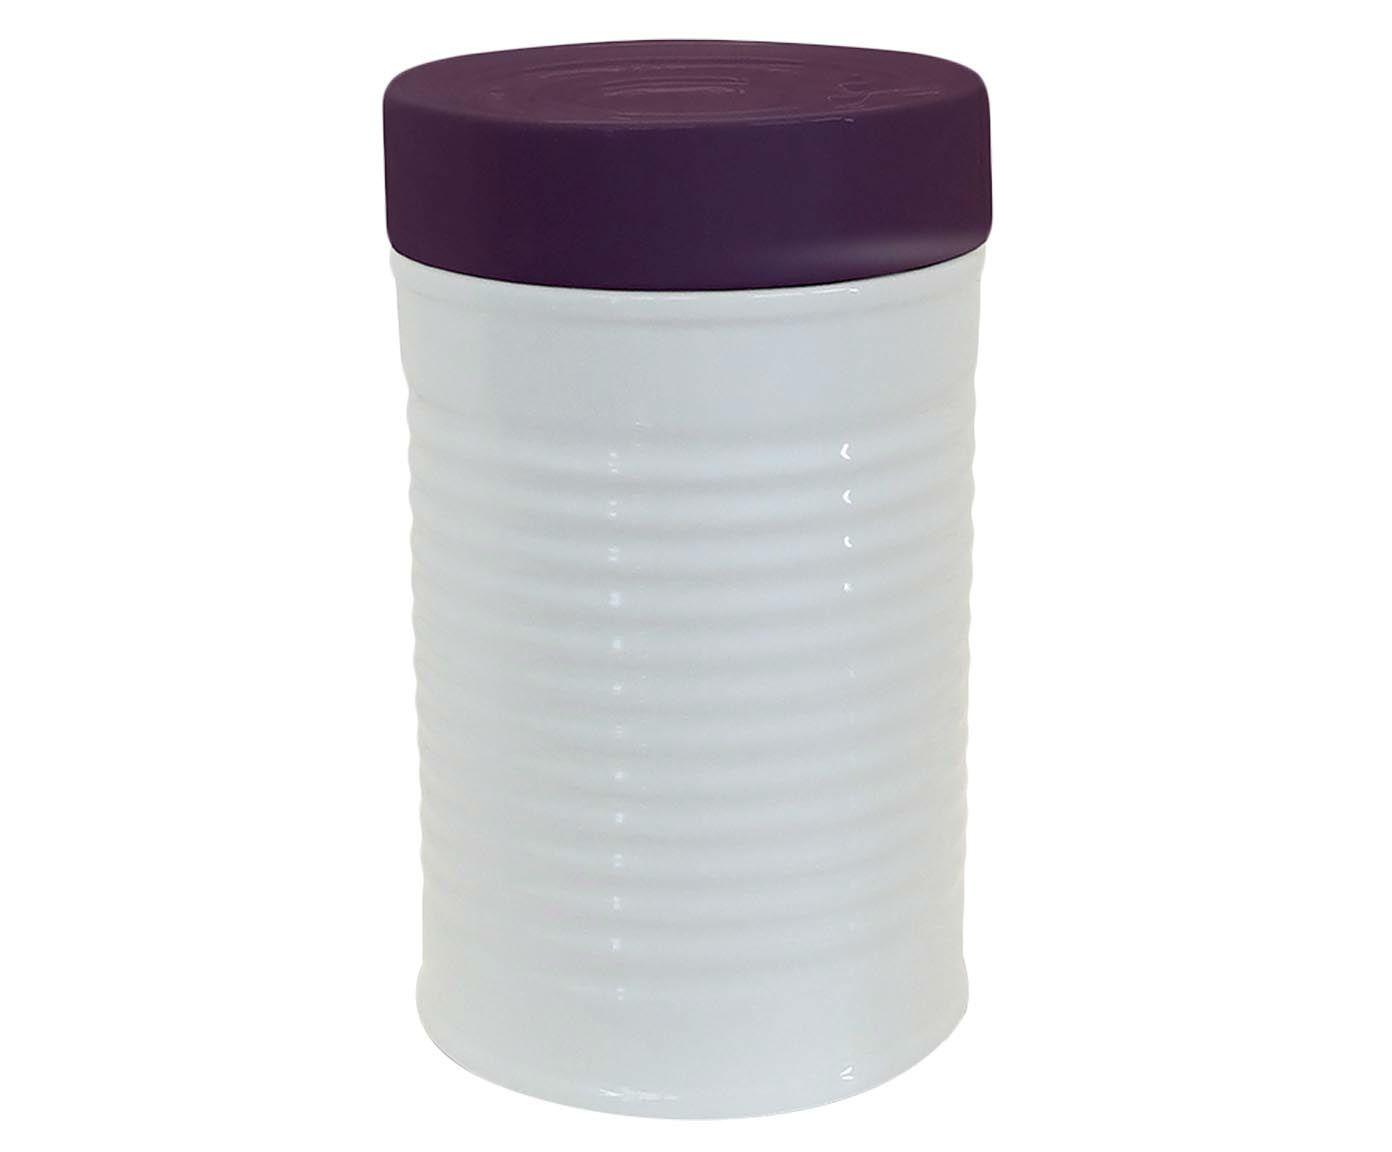 Pote espalier effect - 1300 ml | Westwing.com.br